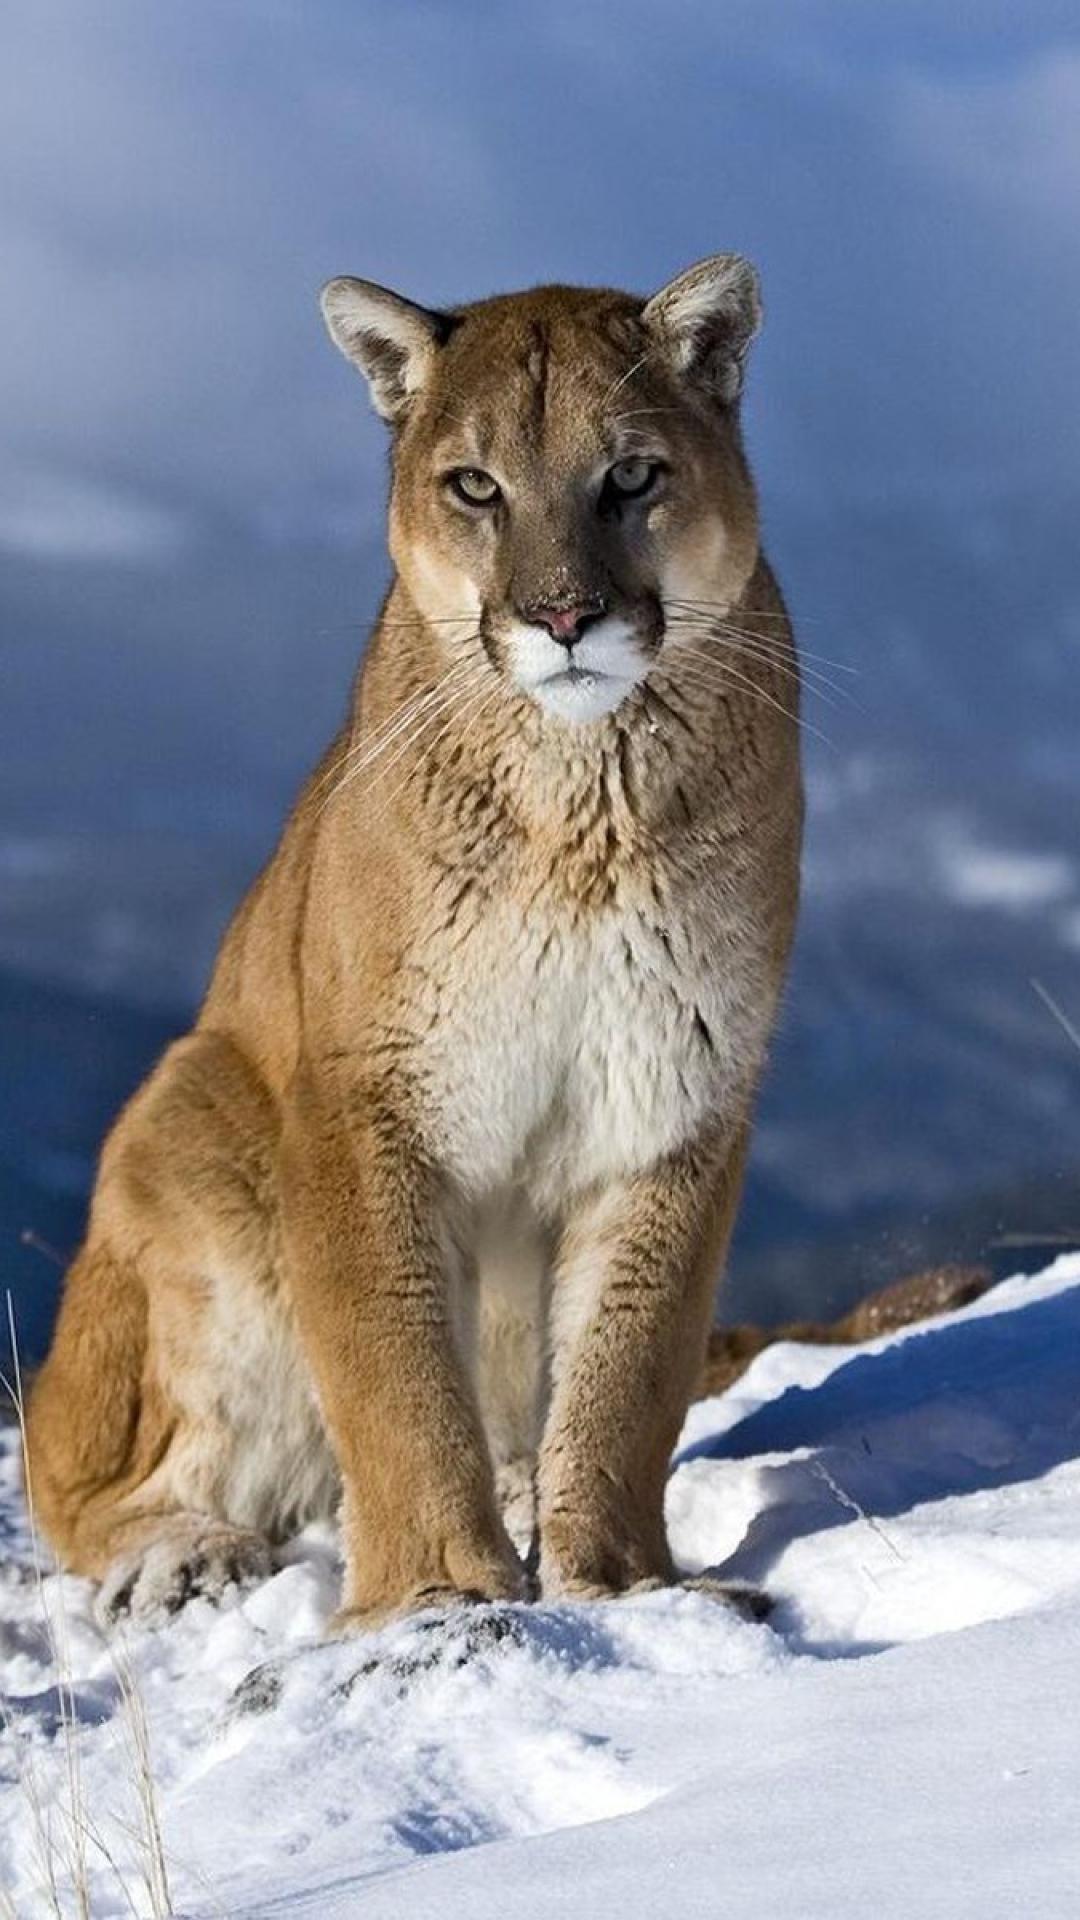 Cougar-Mountain-Lion-wallpaper-wpc5803743